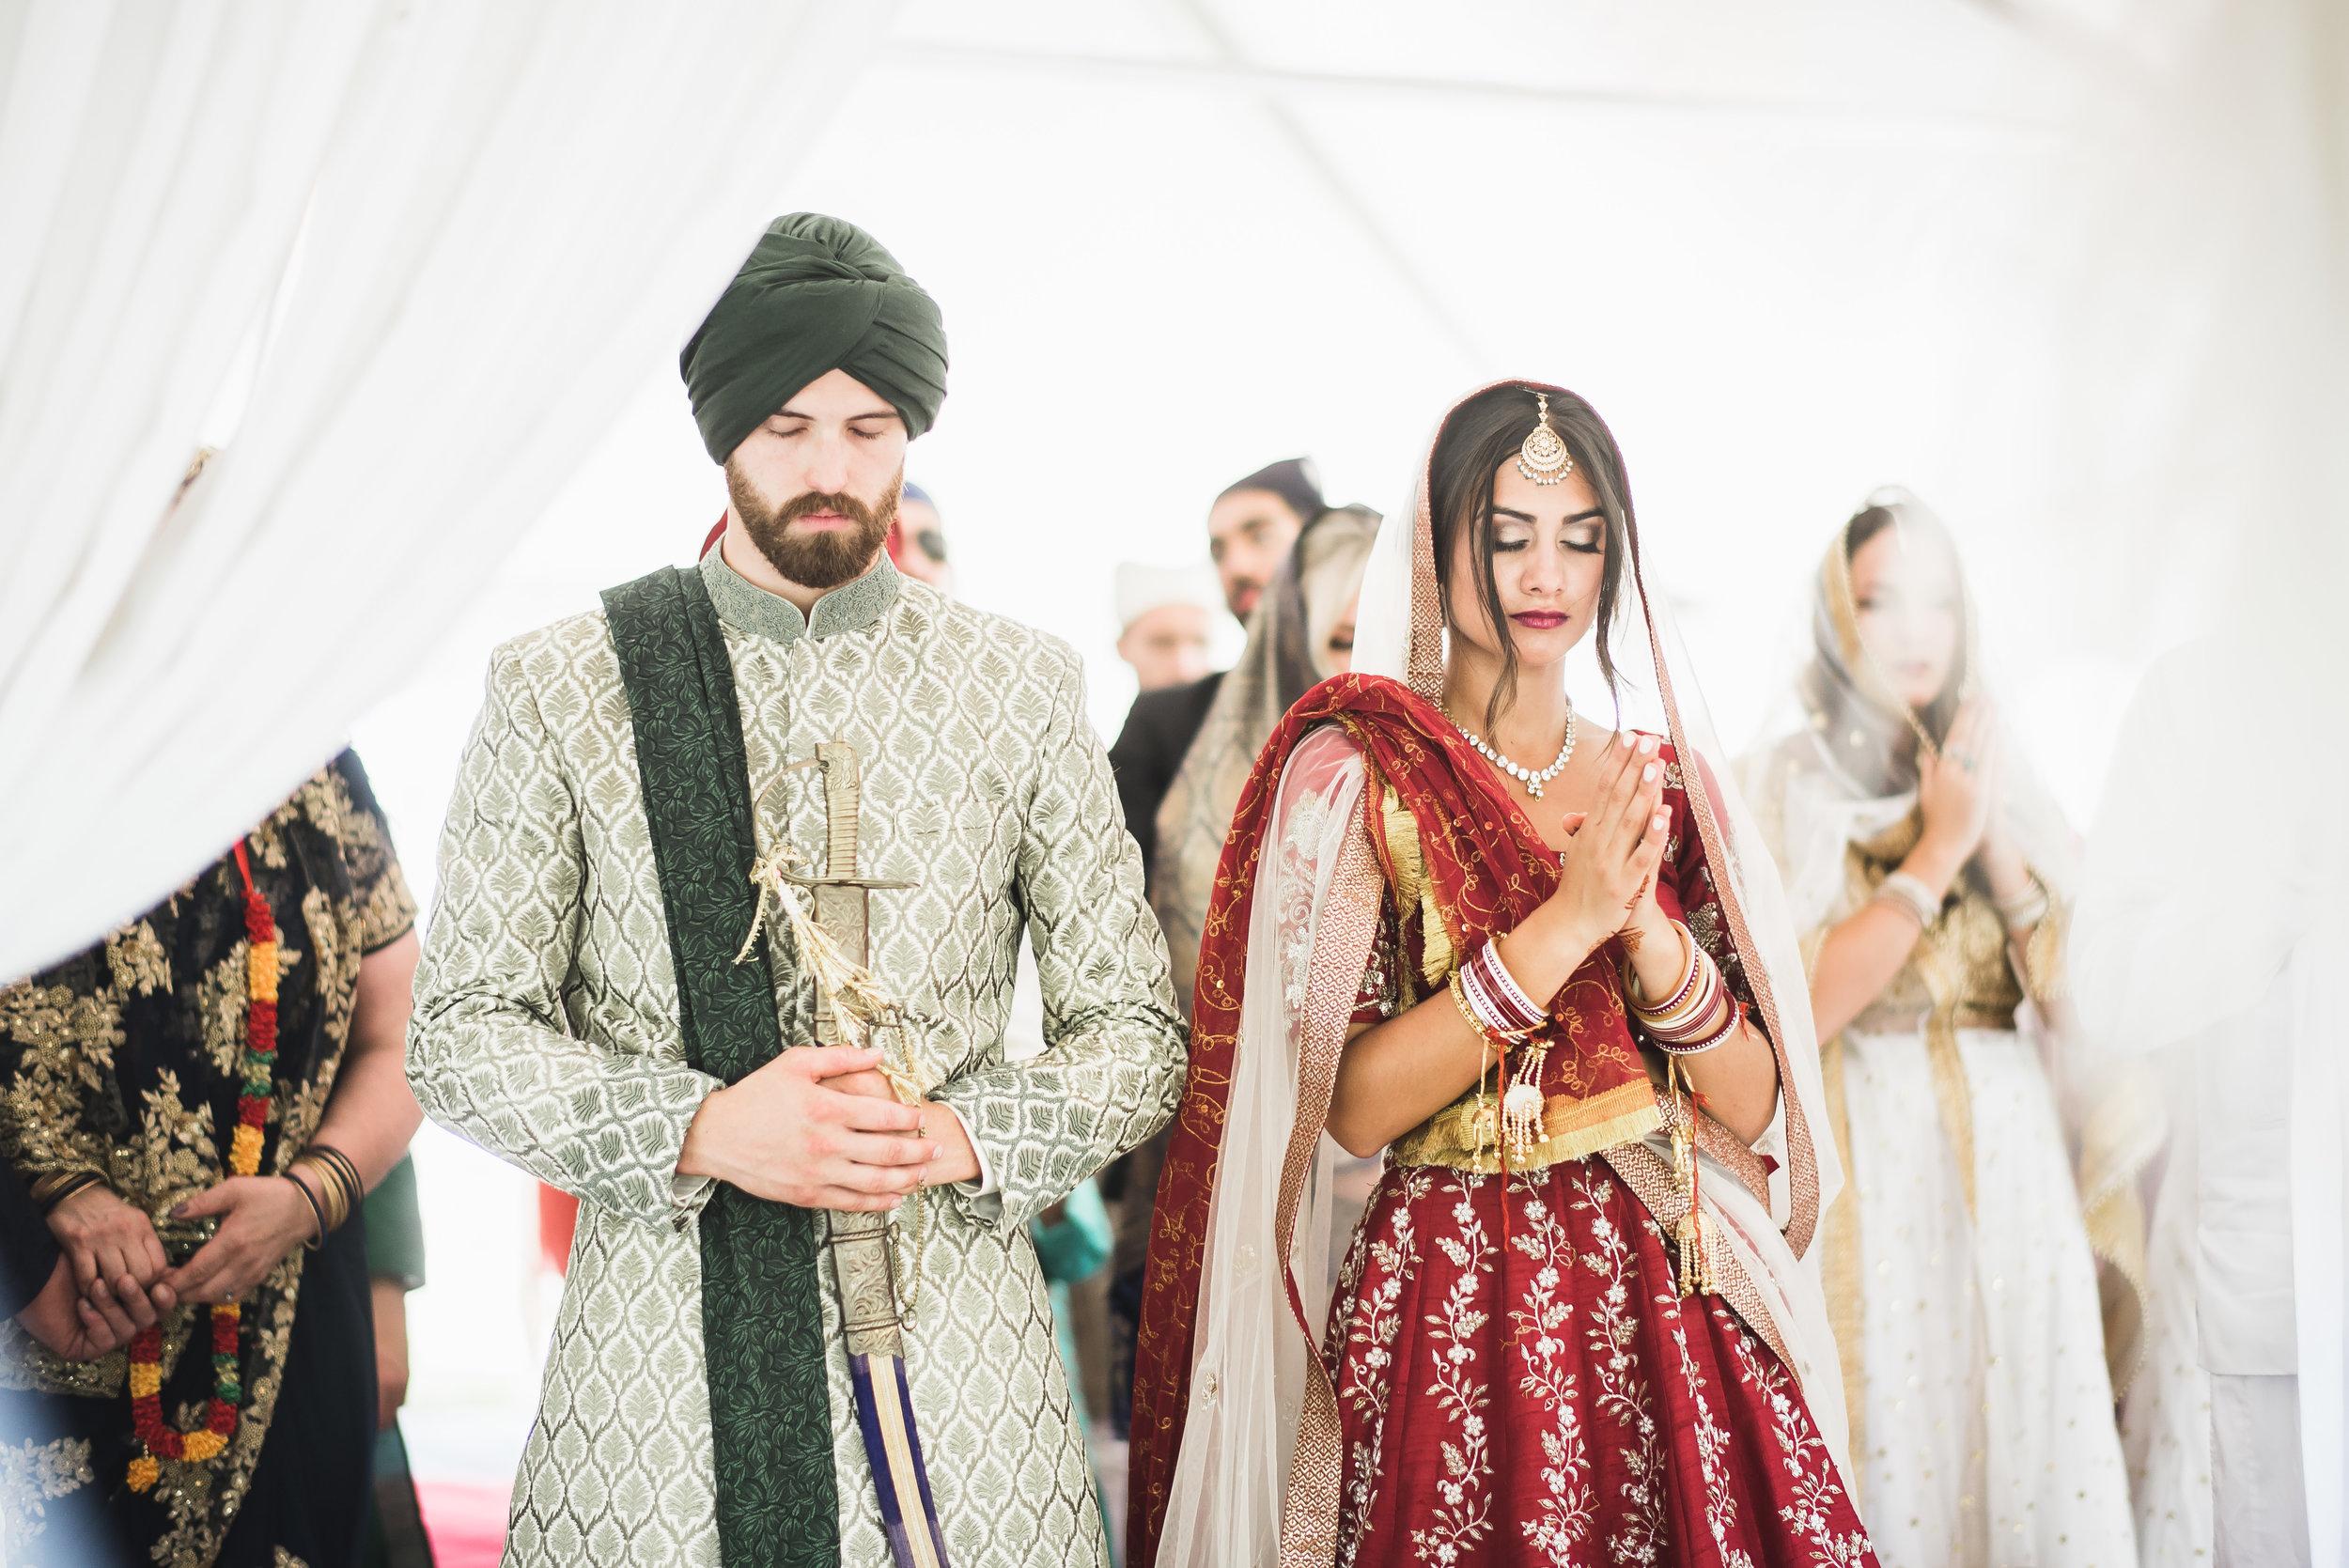 sophia_christopher_wedding_bw_2018_by_lucas_botz_photography_L75_7972.jpg